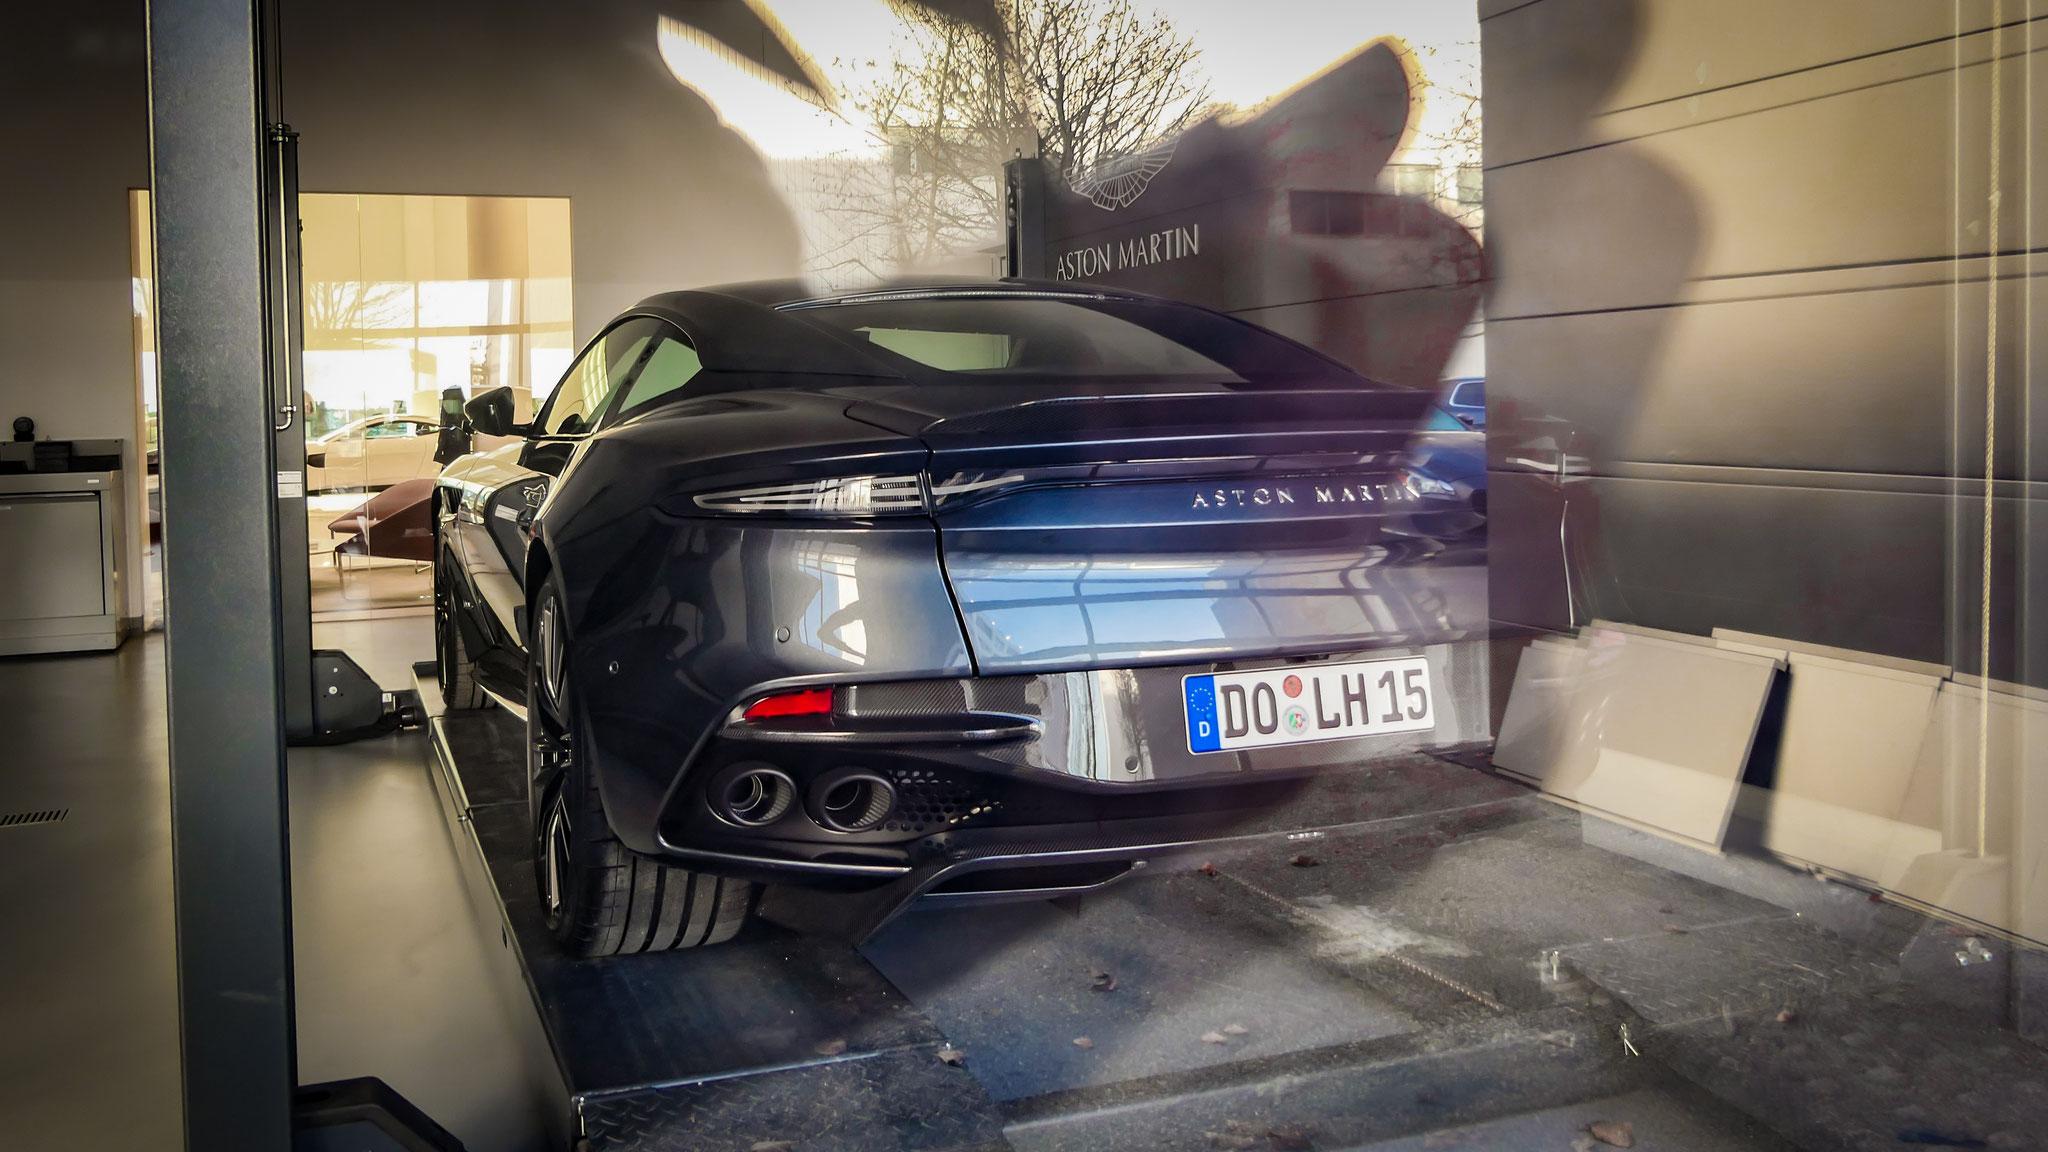 Aston Martin DBS Superleggera - DO-LH-15